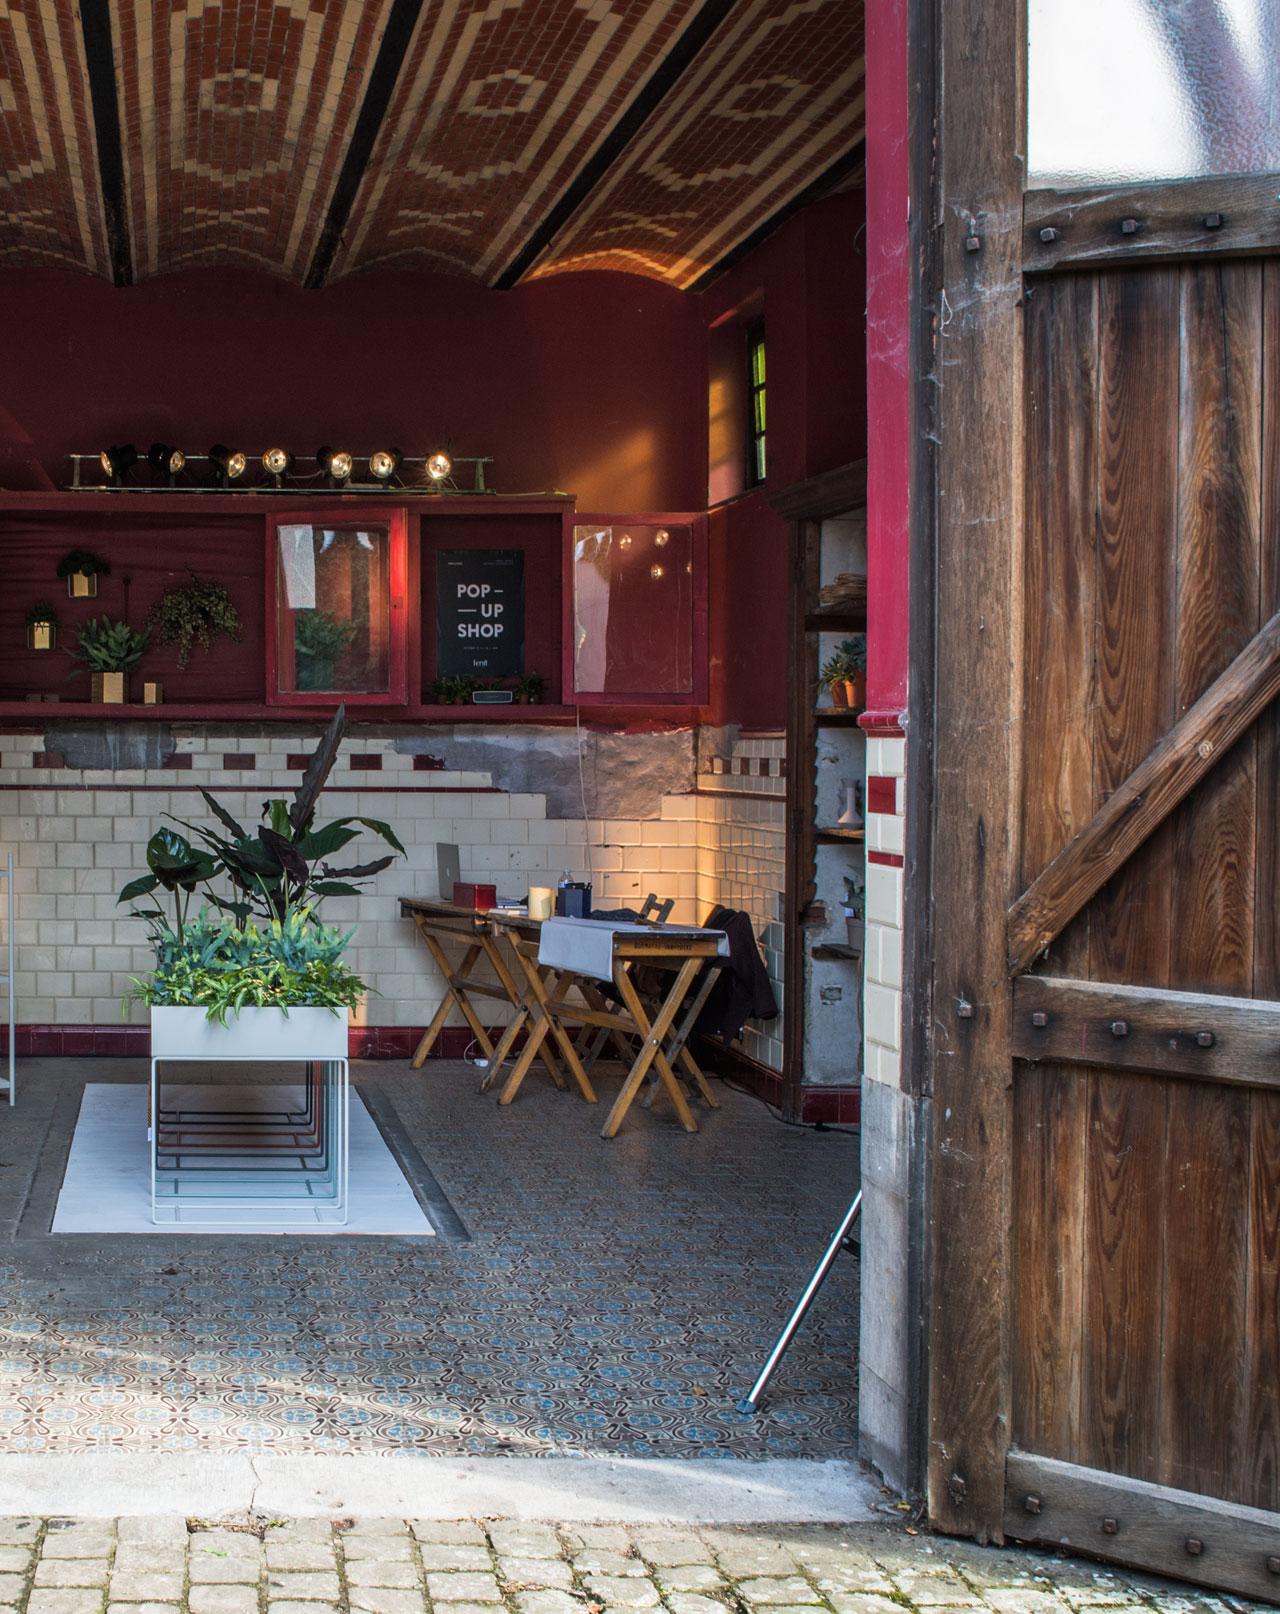 URBAN JUNGLEpop-up shop by Danish label ferm LIVING in collaboration with localfurniture shop de Beste Kamer.